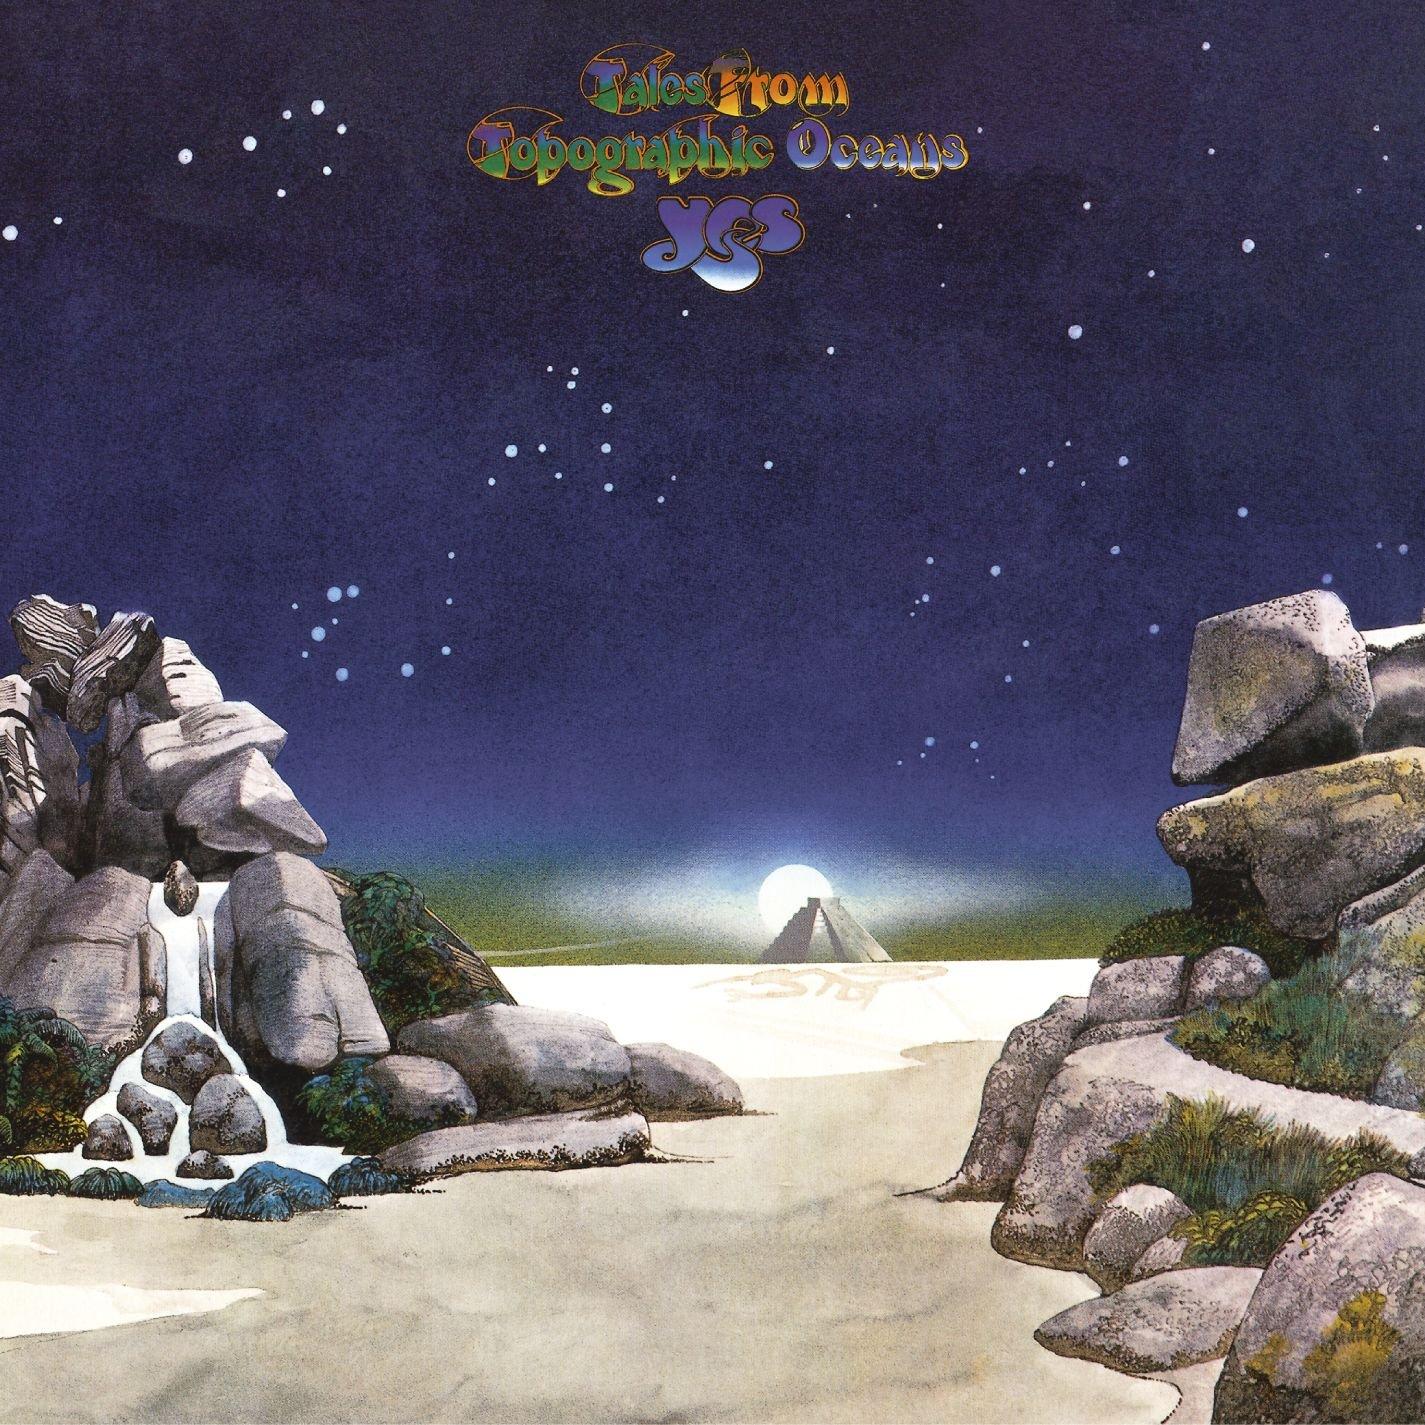 [Rock Progressif] Playlist - Page 22 81ma7XiCrvL._SL1425_